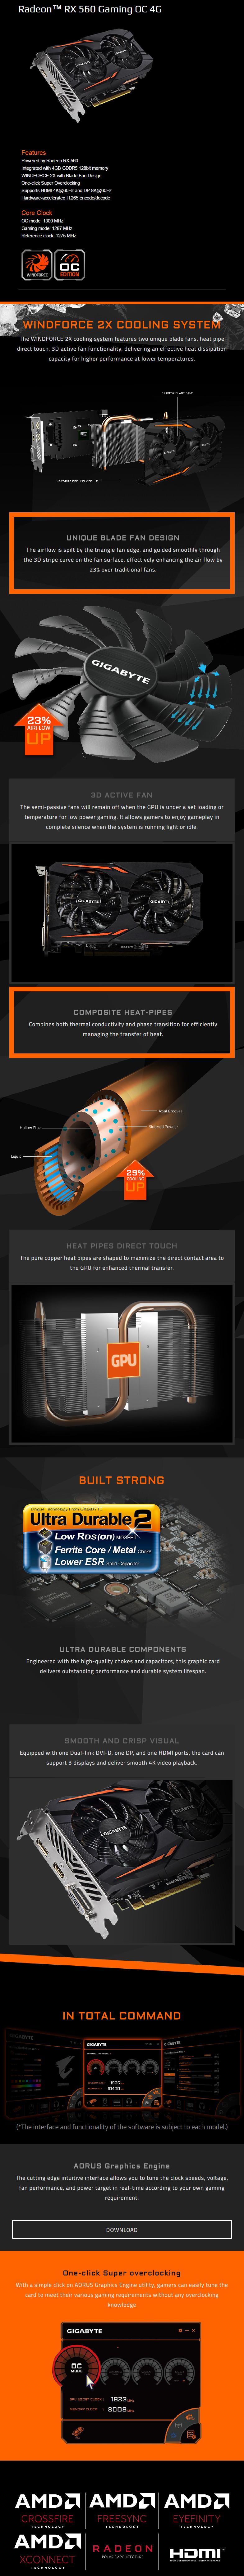 Gigabyte Radeon RX 560 Gaming OC 4GB GDDR5 PCIE GV-RX560GAMING OC-4GD